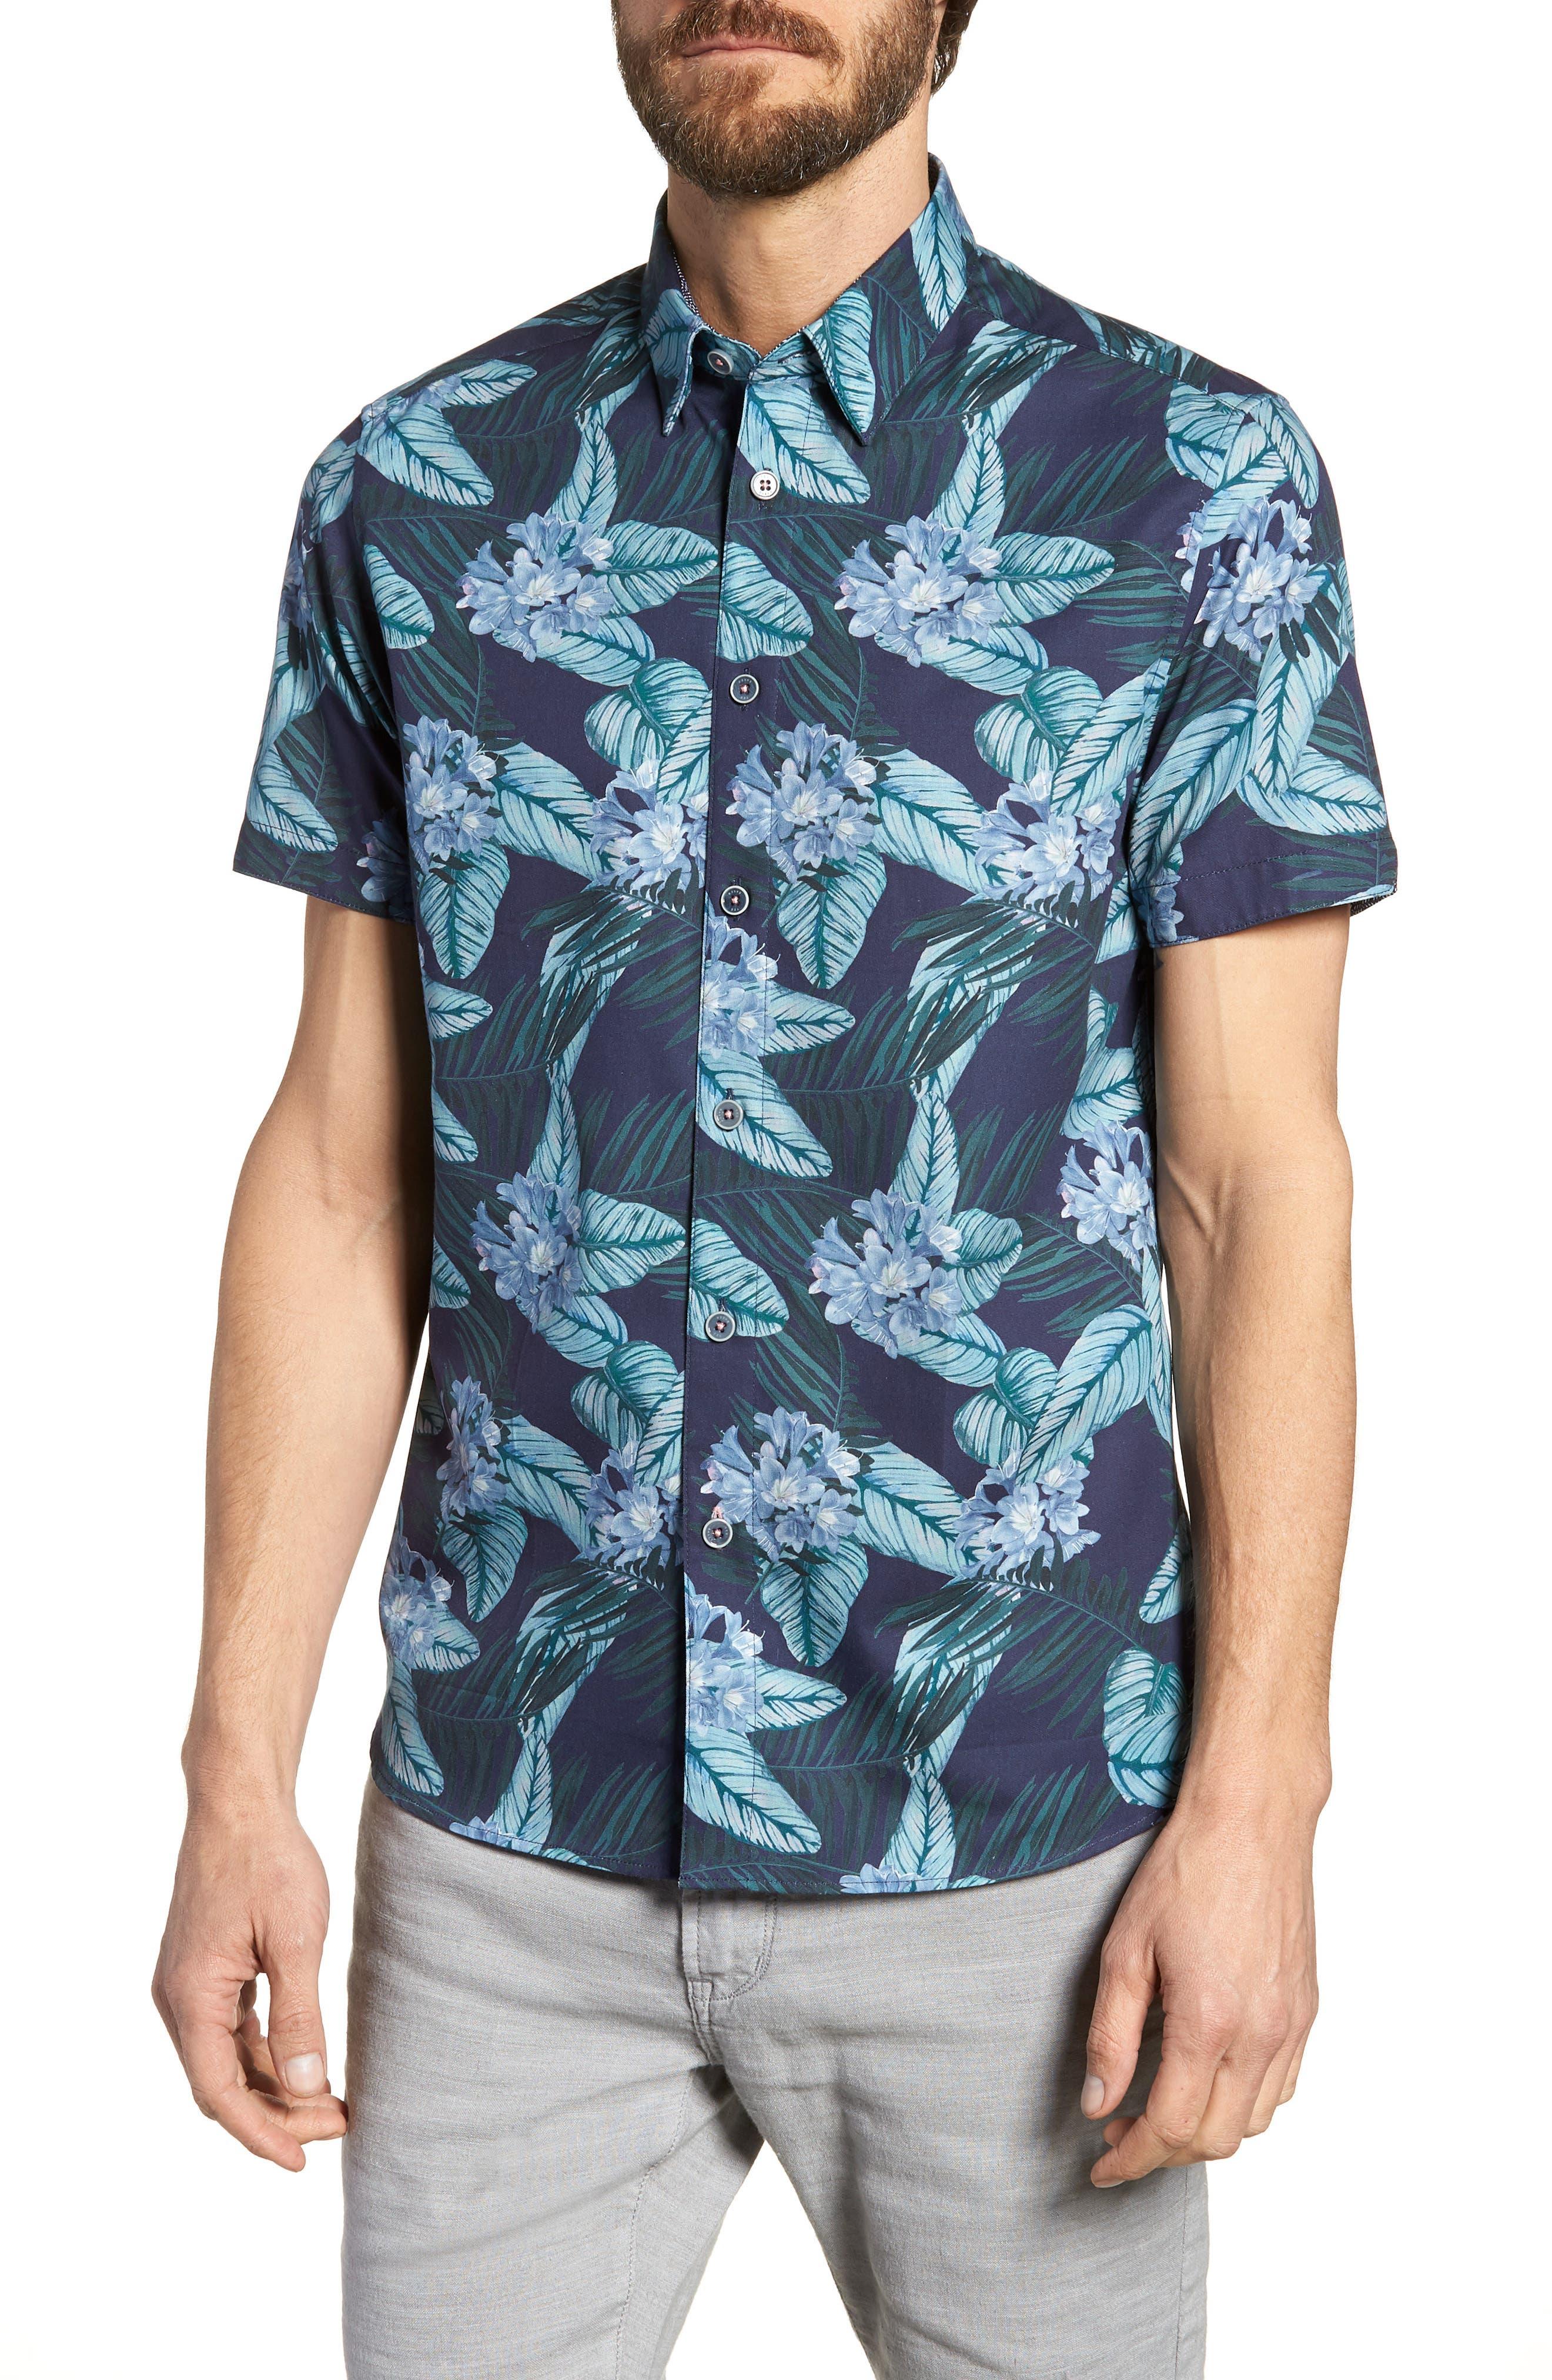 Folinor Slim Fit Floral Cotton Shirt,                         Main,                         color, Navy